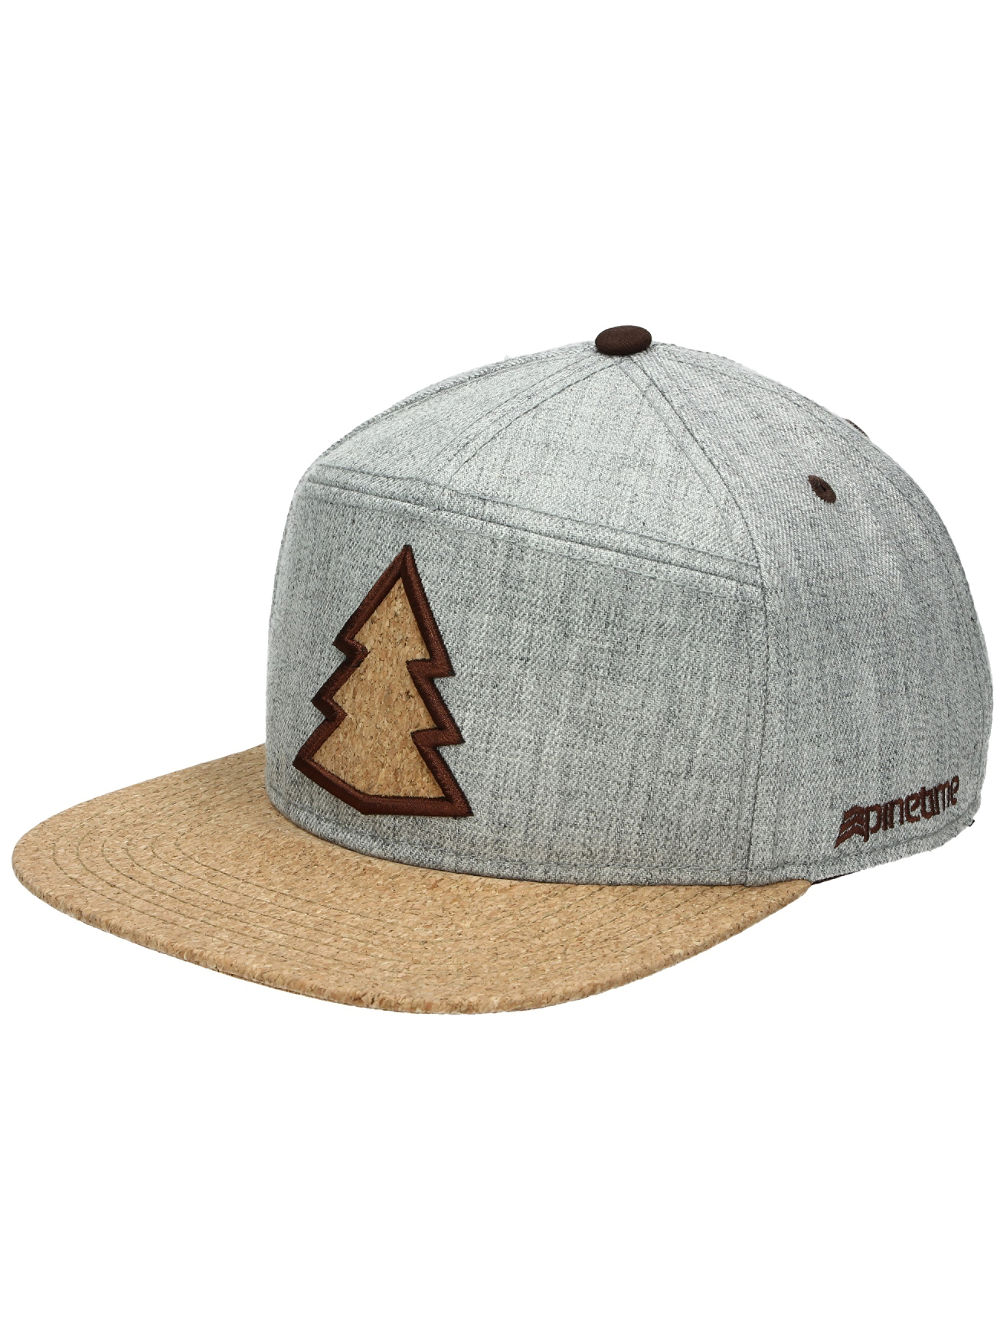 pinetime-tree-cap